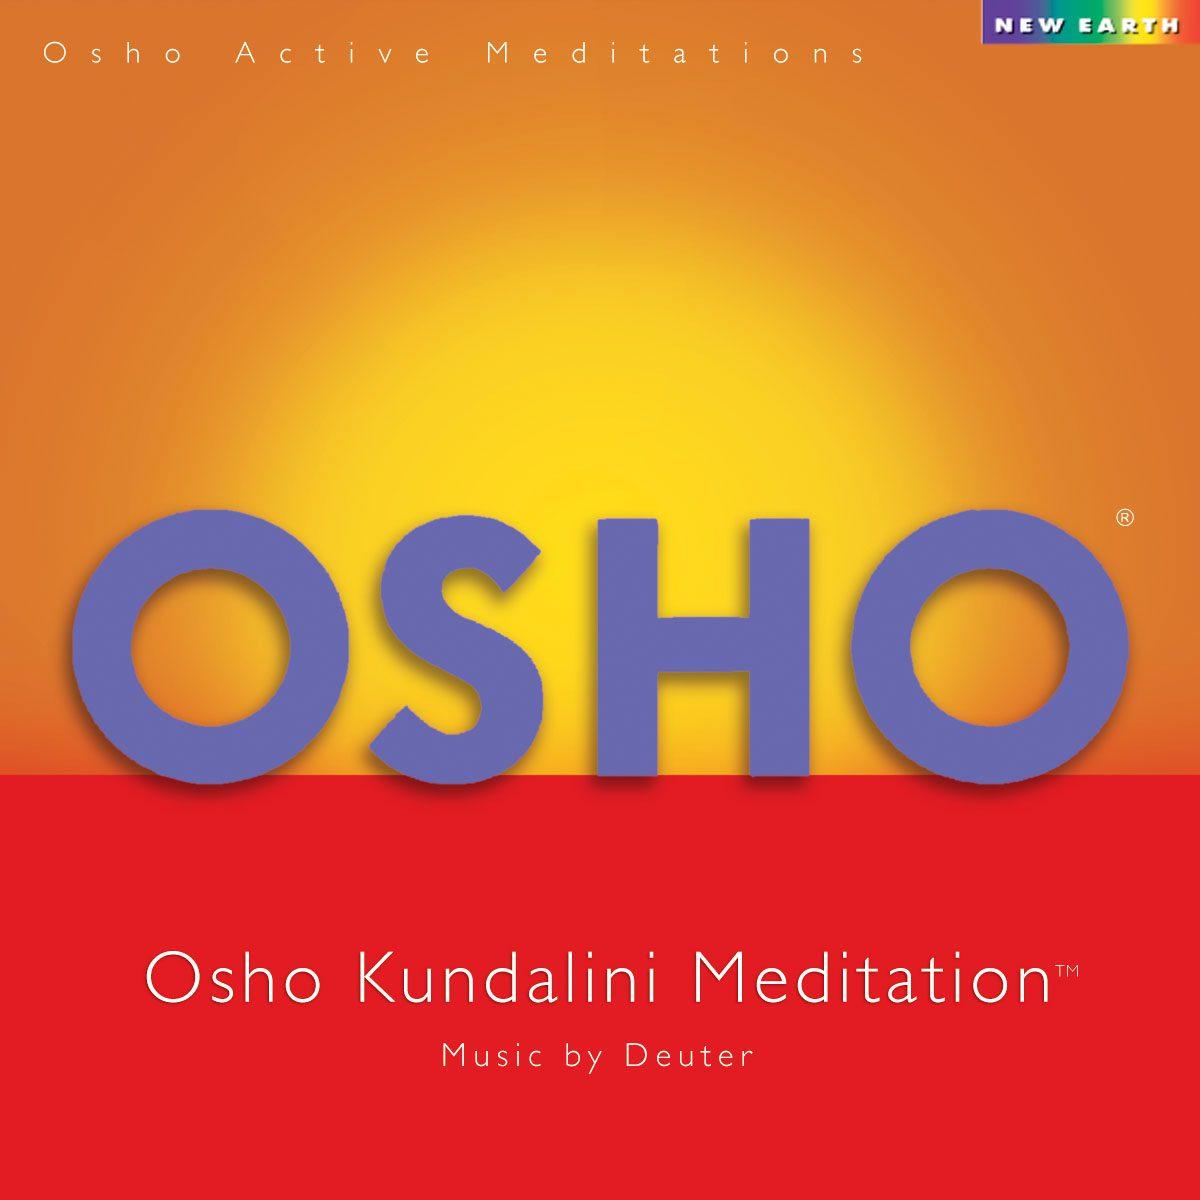 Meditation video: download osho dynamic meditation video.